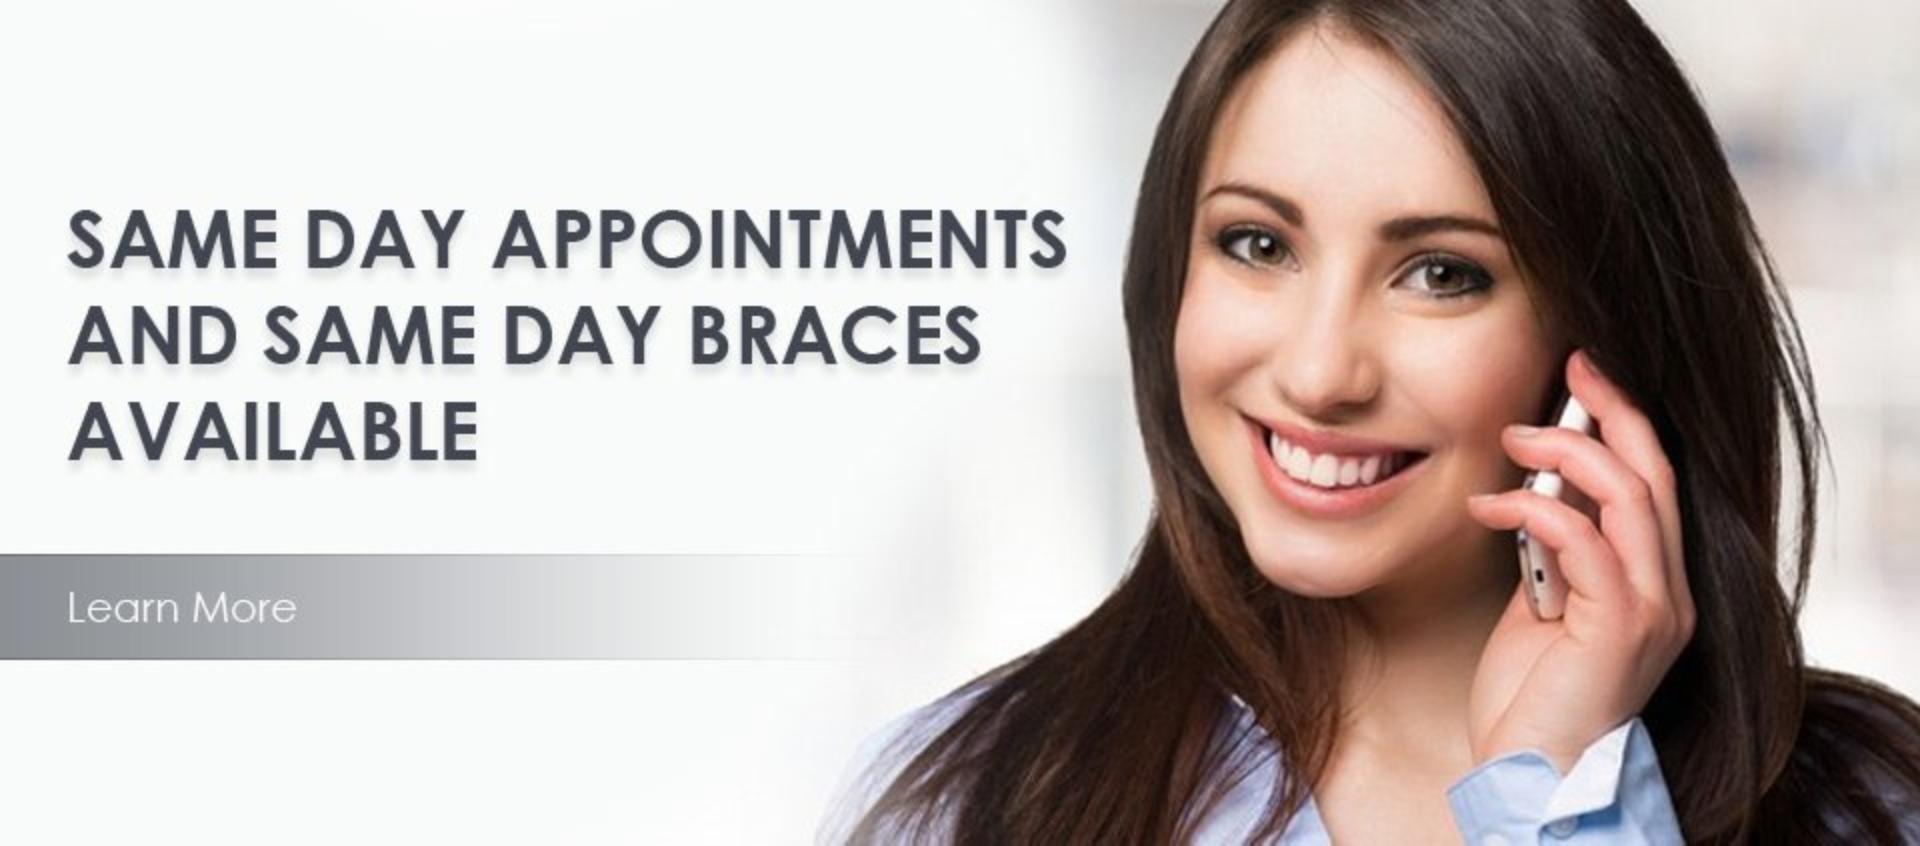 duchesne-ut-utah-orthodontists-2